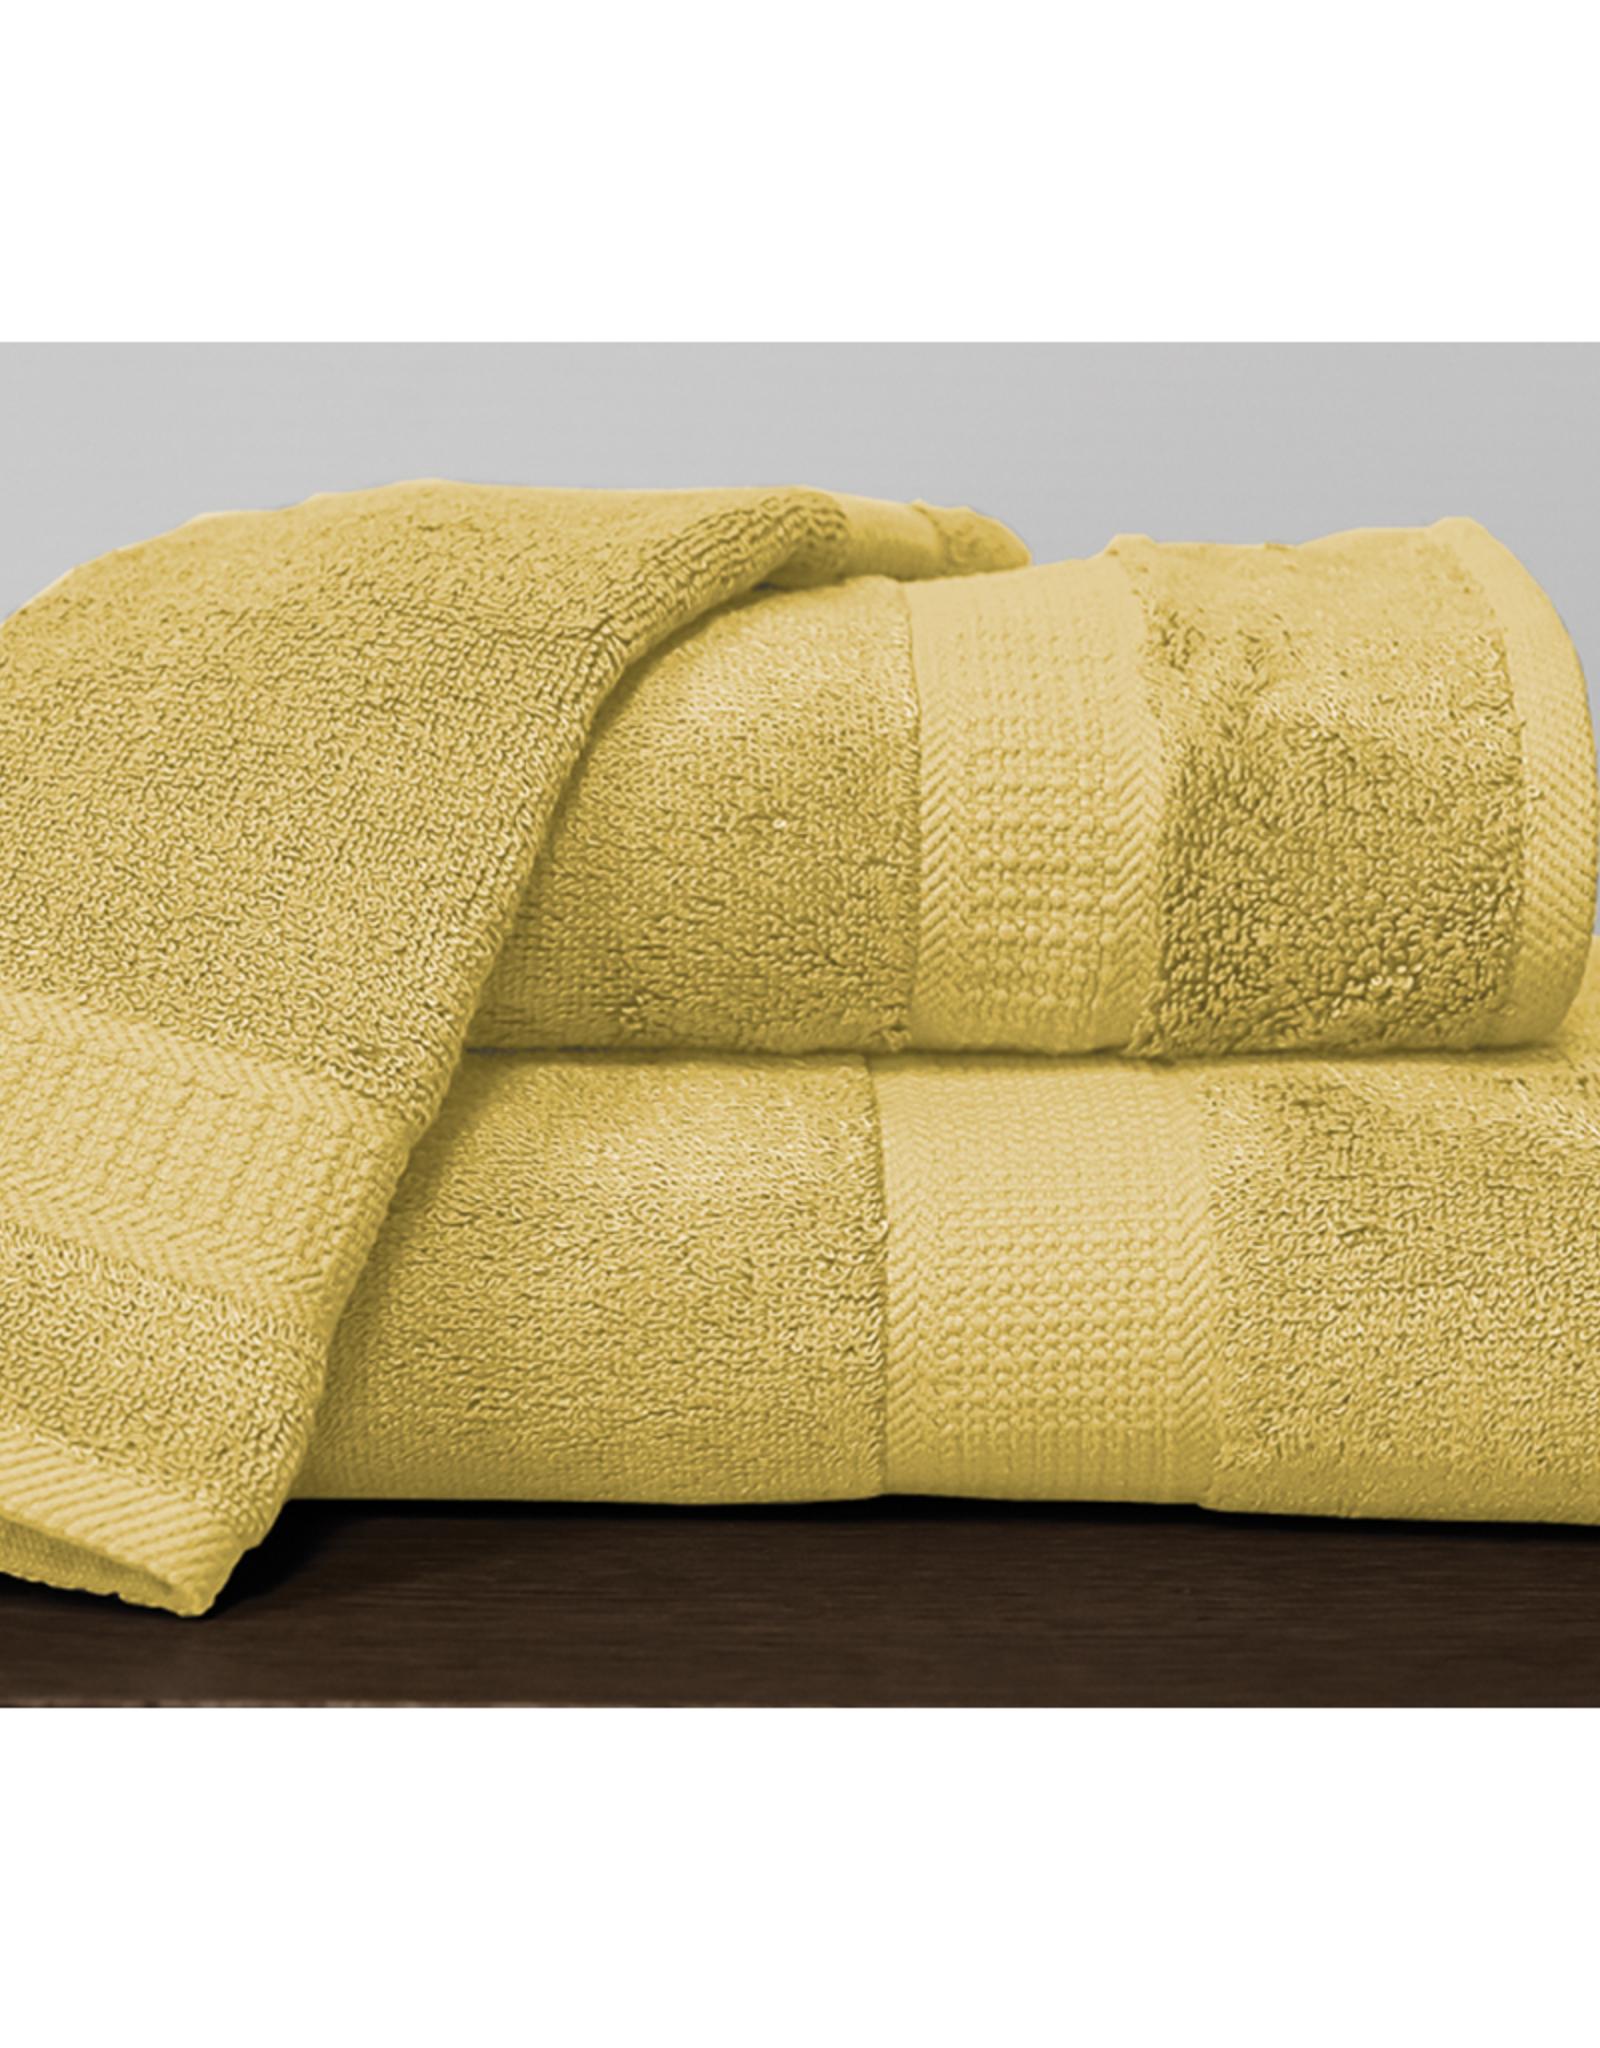 Alamode Home Bath Towel RJS Bamboo Butter Yellow